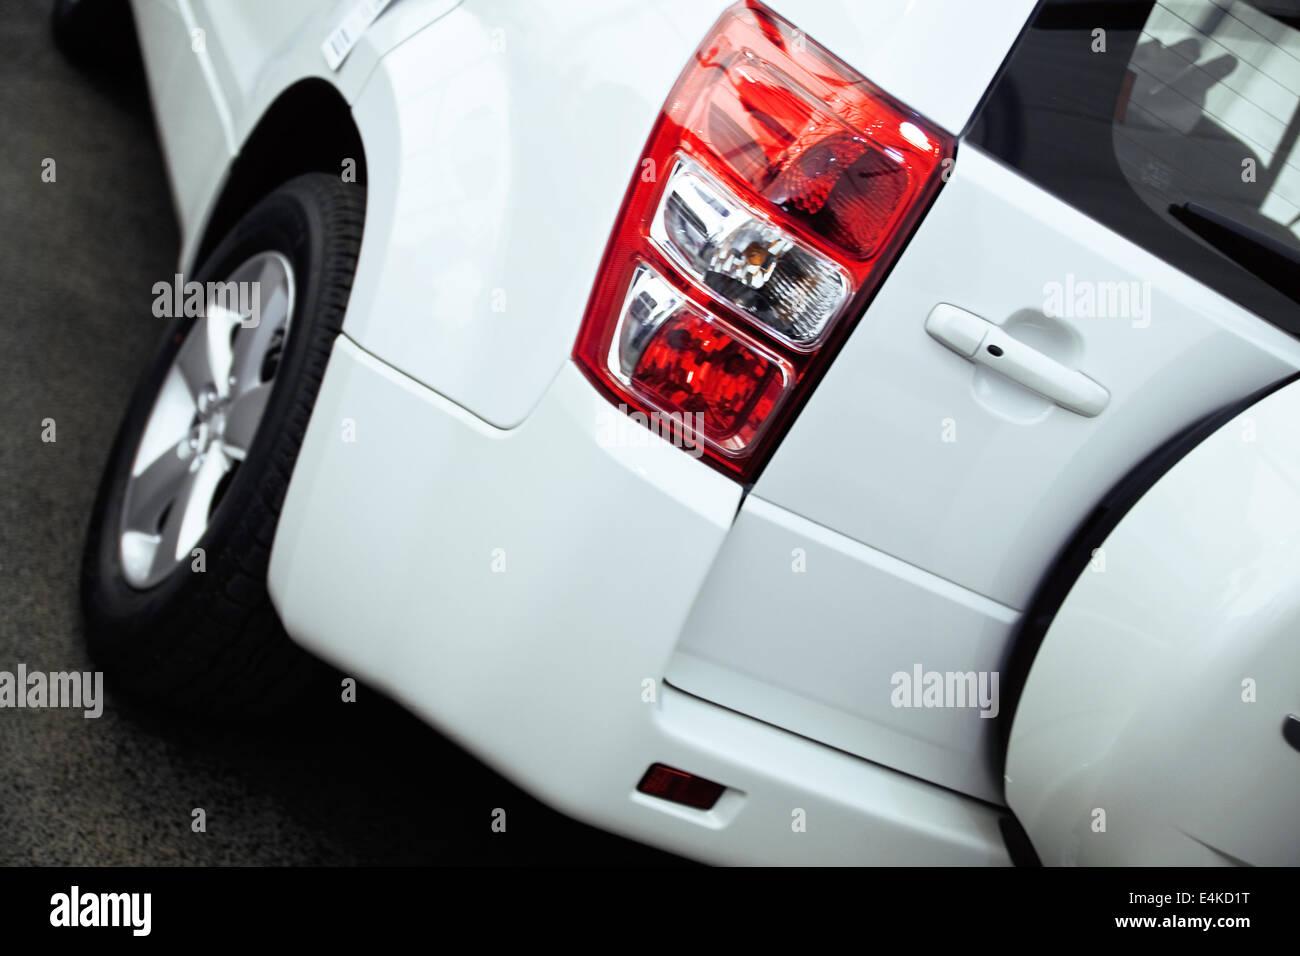 red rear lights of modern passenger car - Stock Image